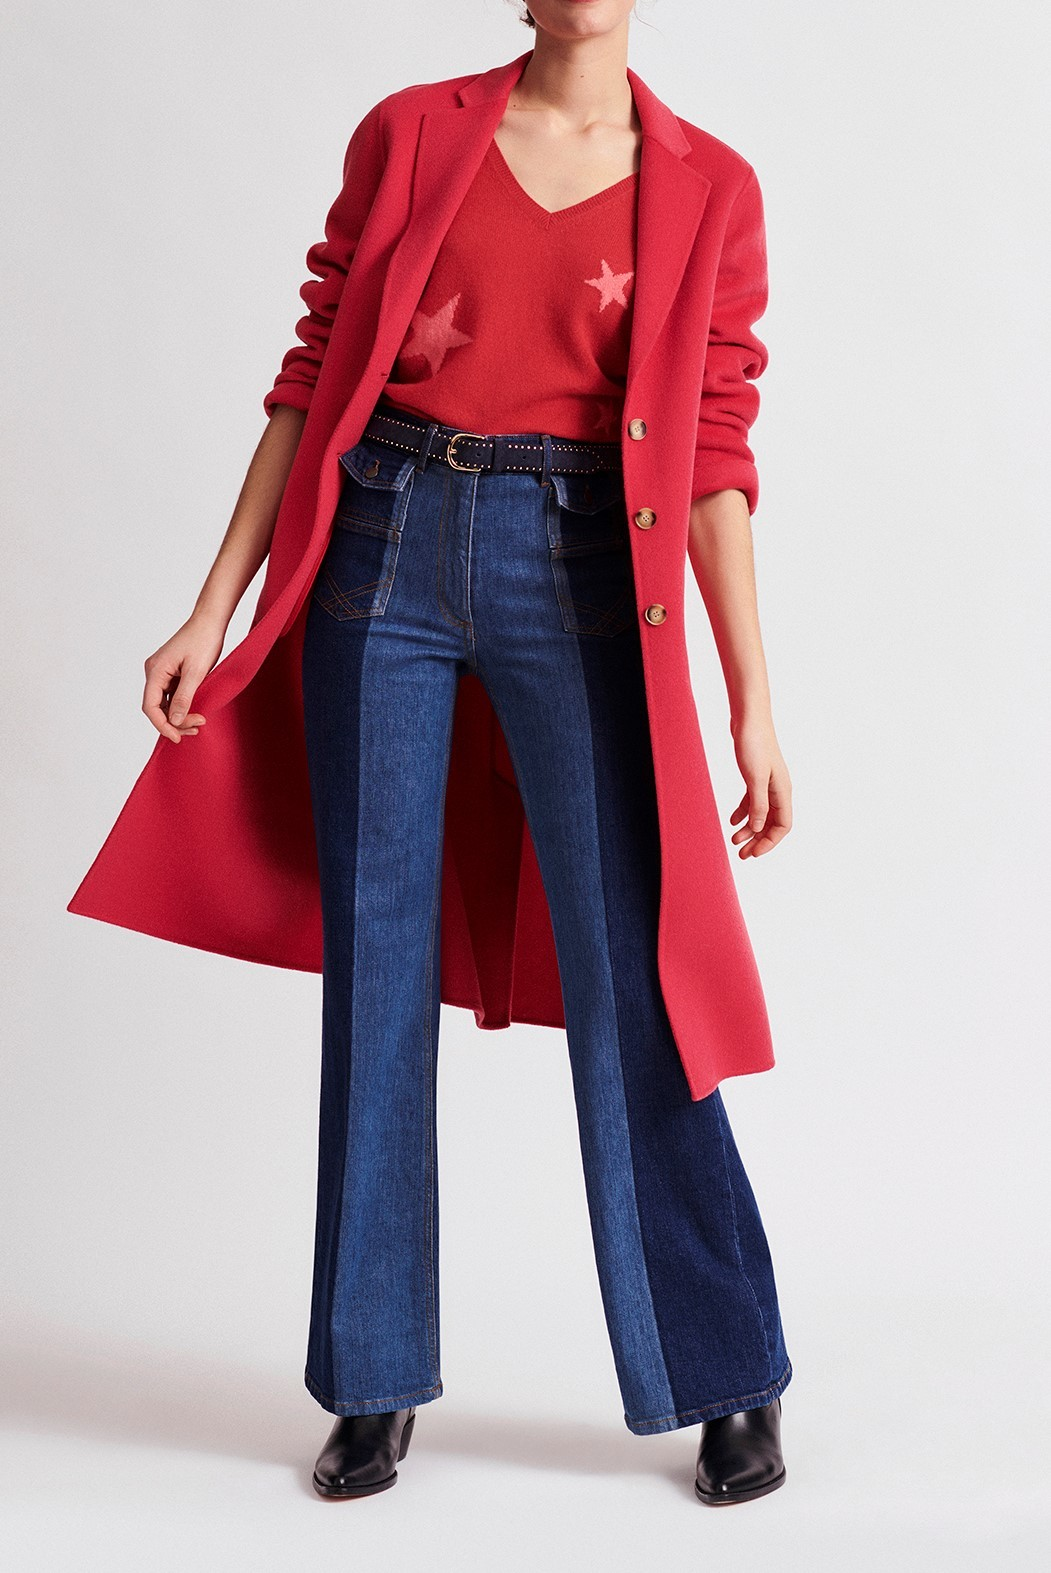 ROSY  - Двойное шерстяное пальто